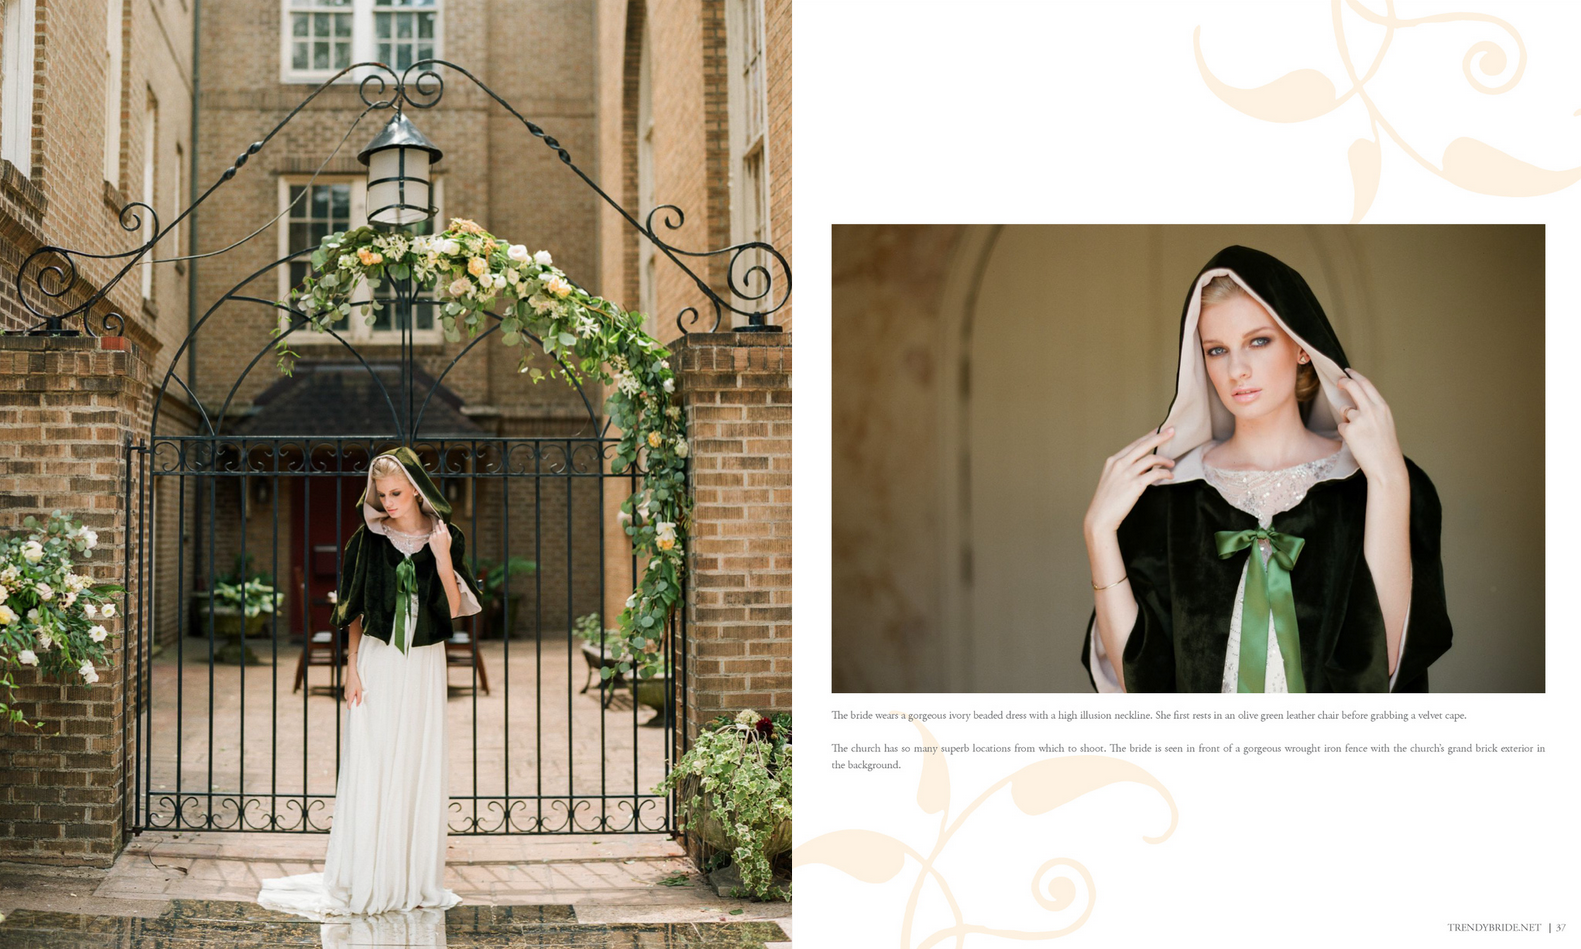 trendy-bride-magazine-ivory-and-beau-savannah-bridal-boutique-sarah-seven-gwen-silver-sequin-wedding-dress-olive-wedding-inspiration.png